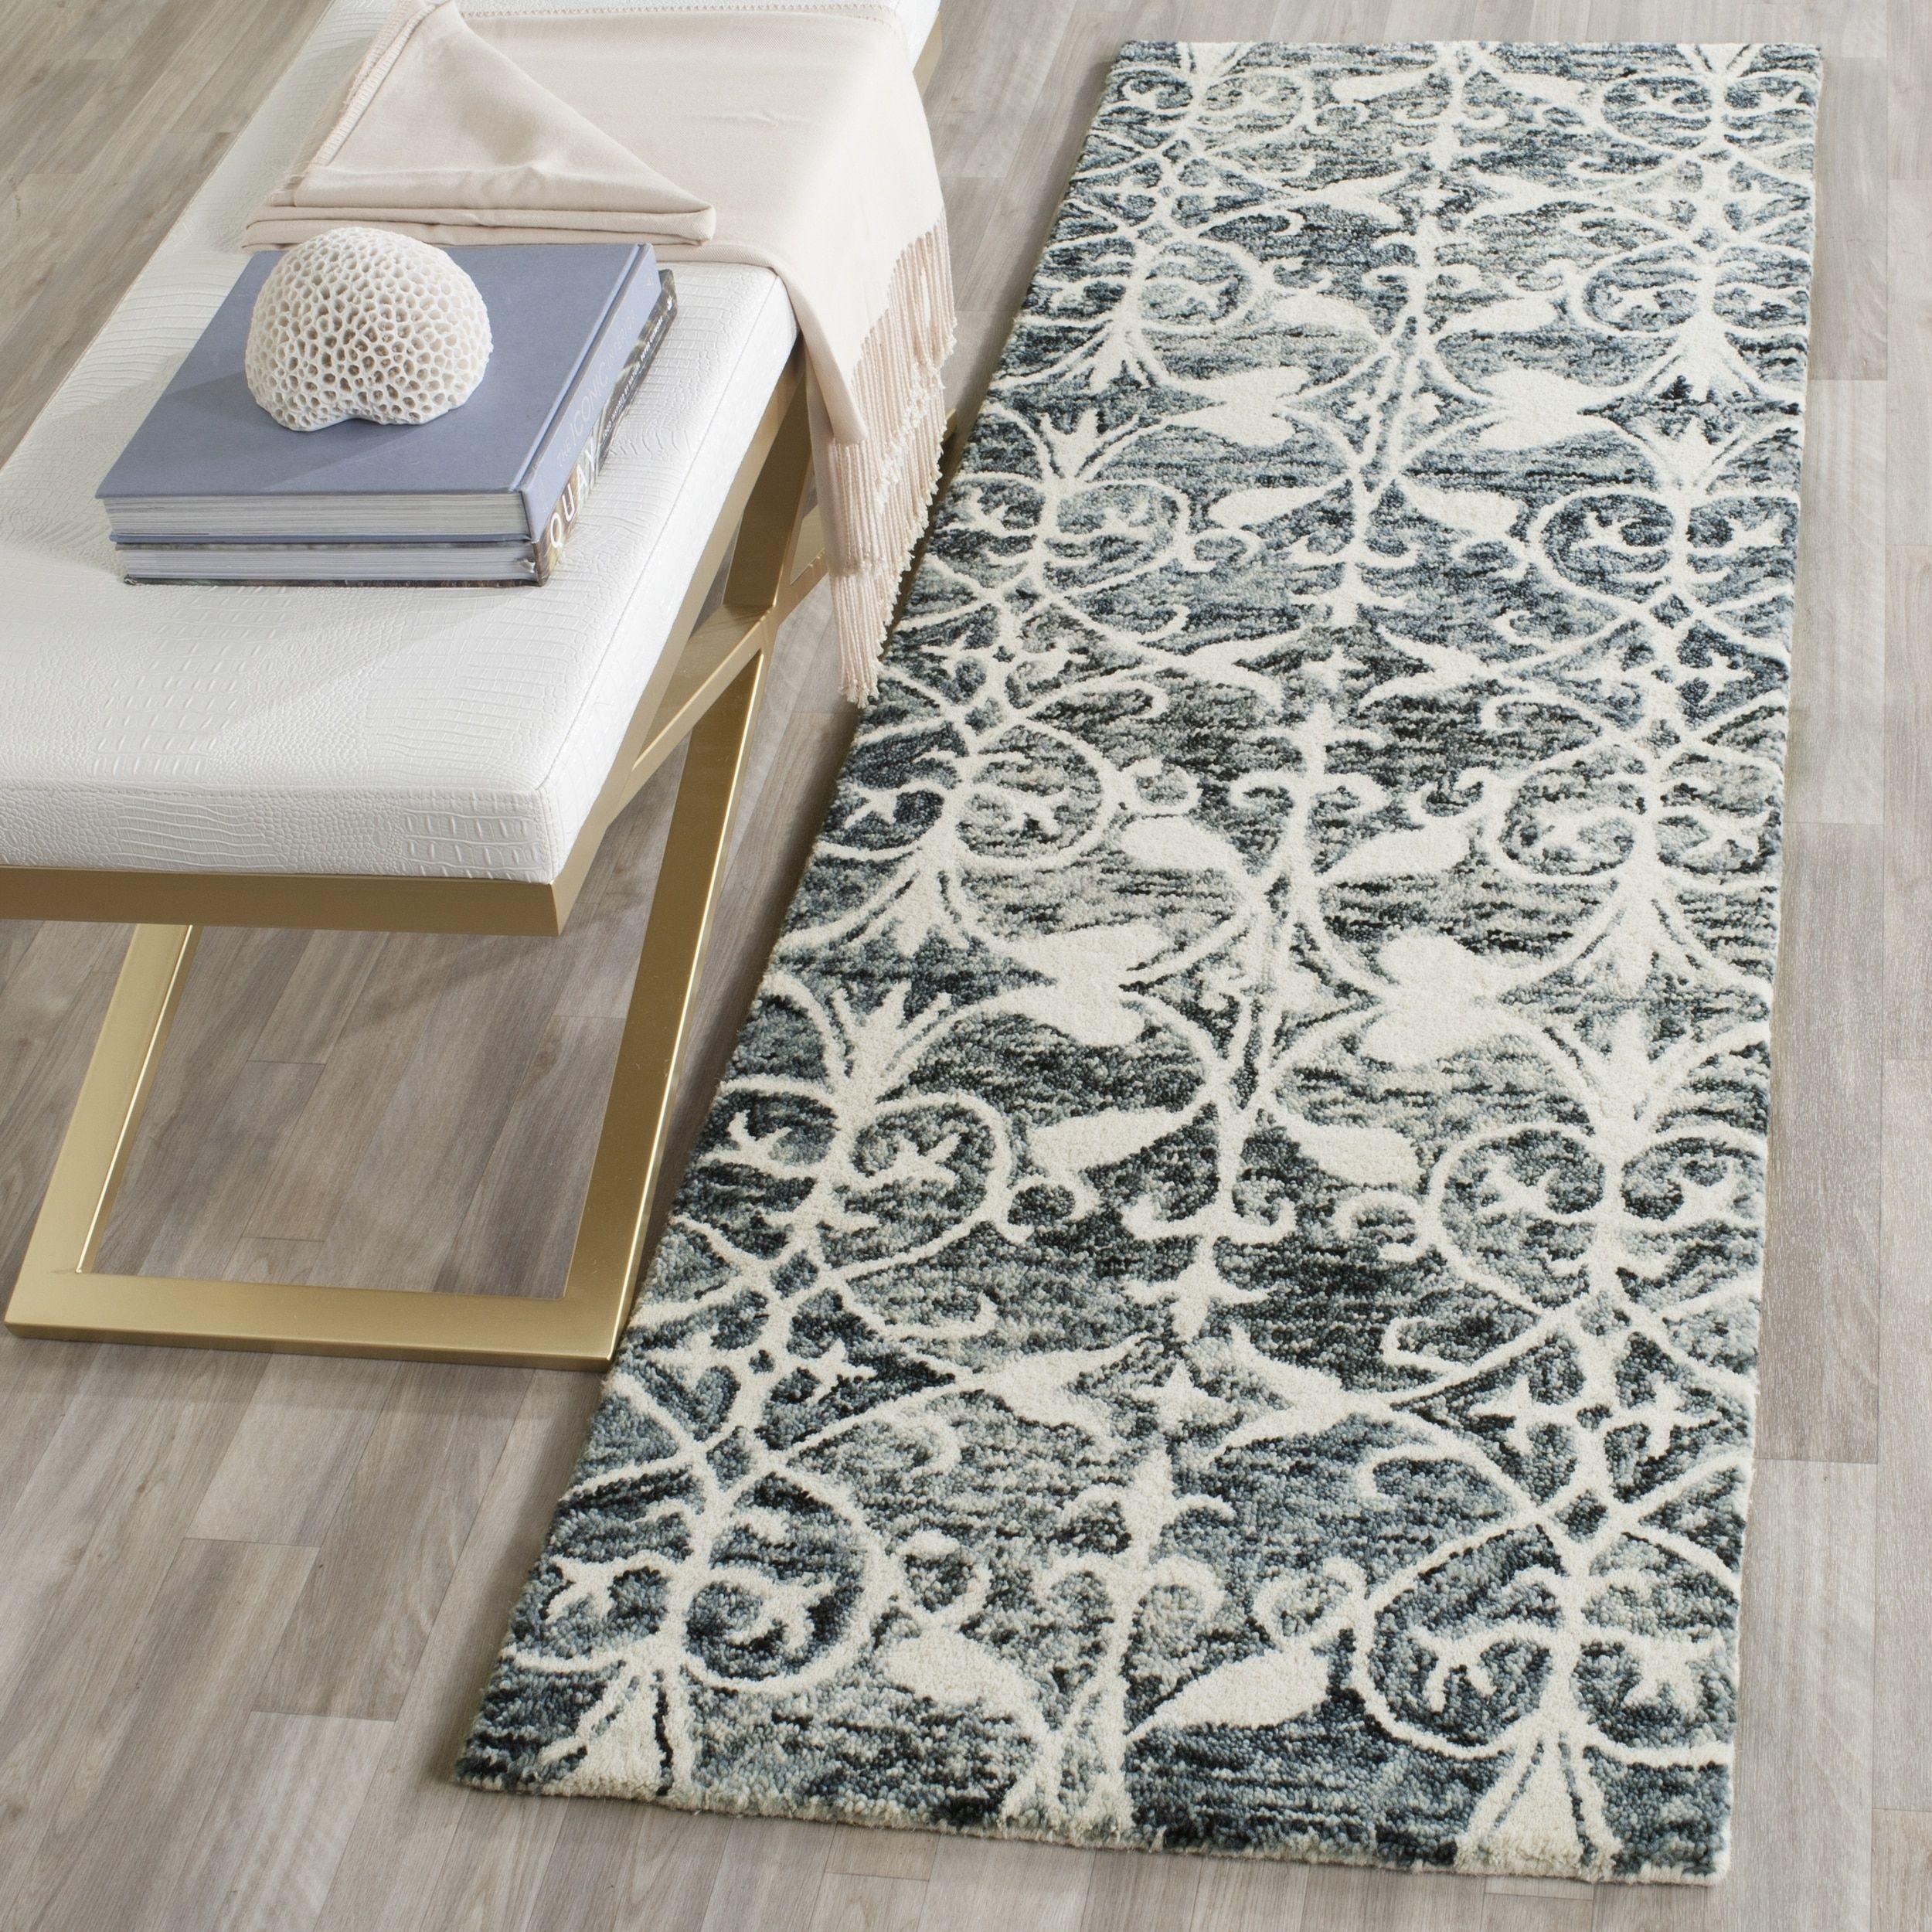 Safavieh handmade chatham charcoal ivory wool rug u x